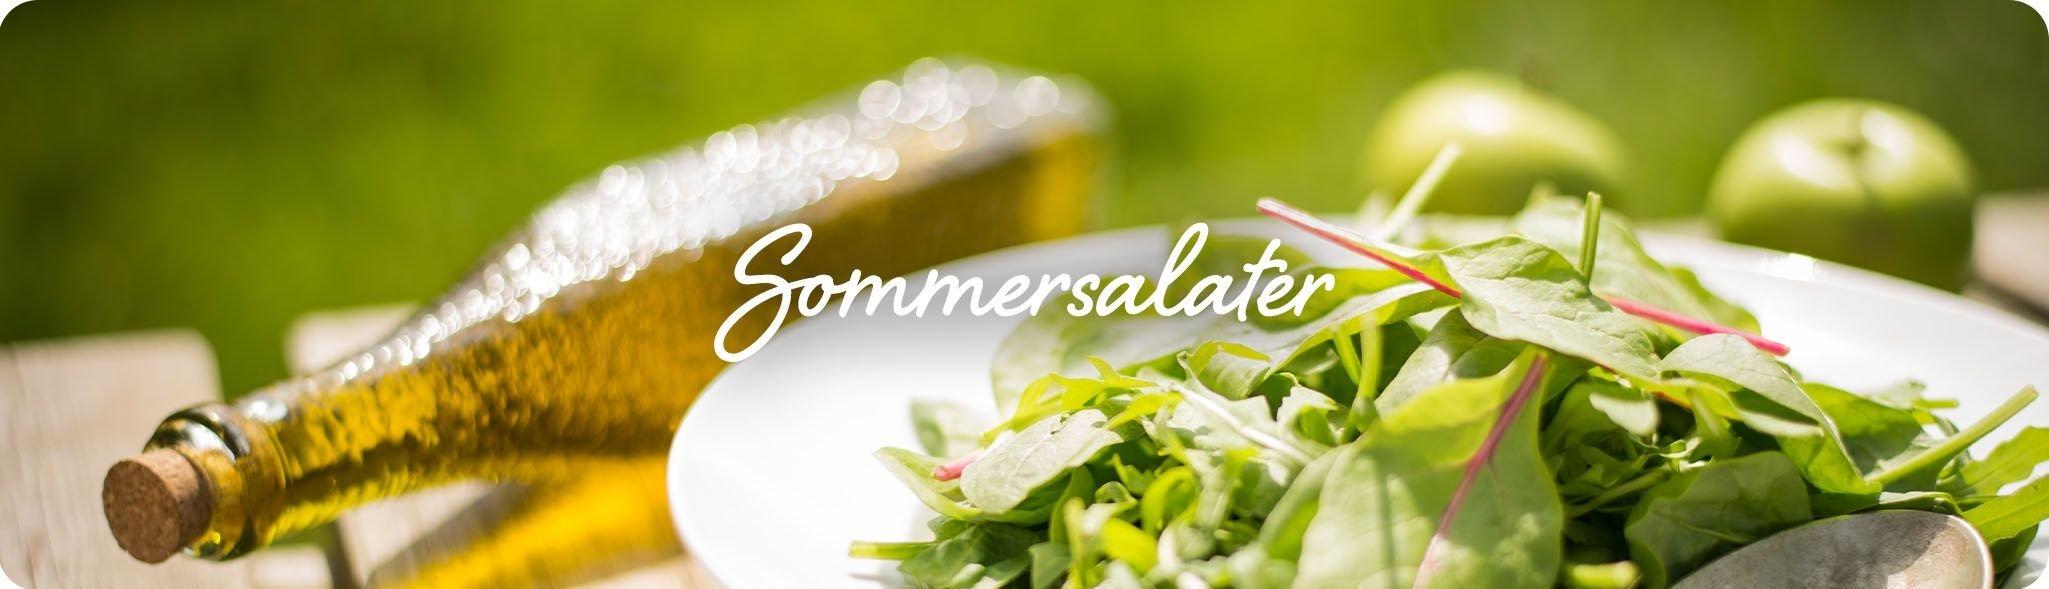 Sommersalat